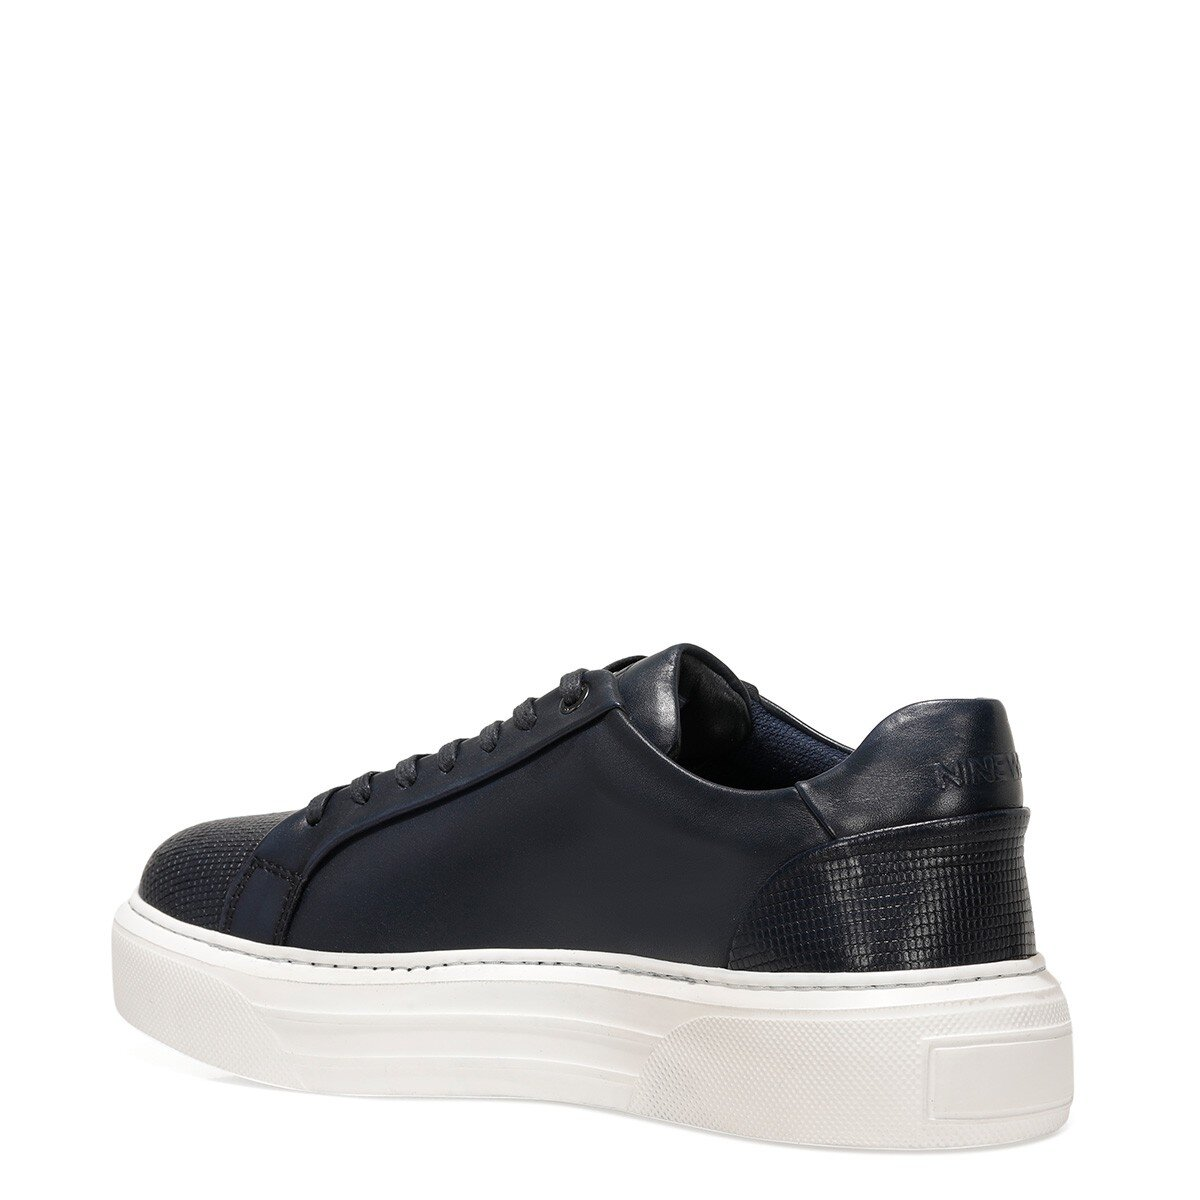 YUNA 1FX Lacivert Erkek Sneaker